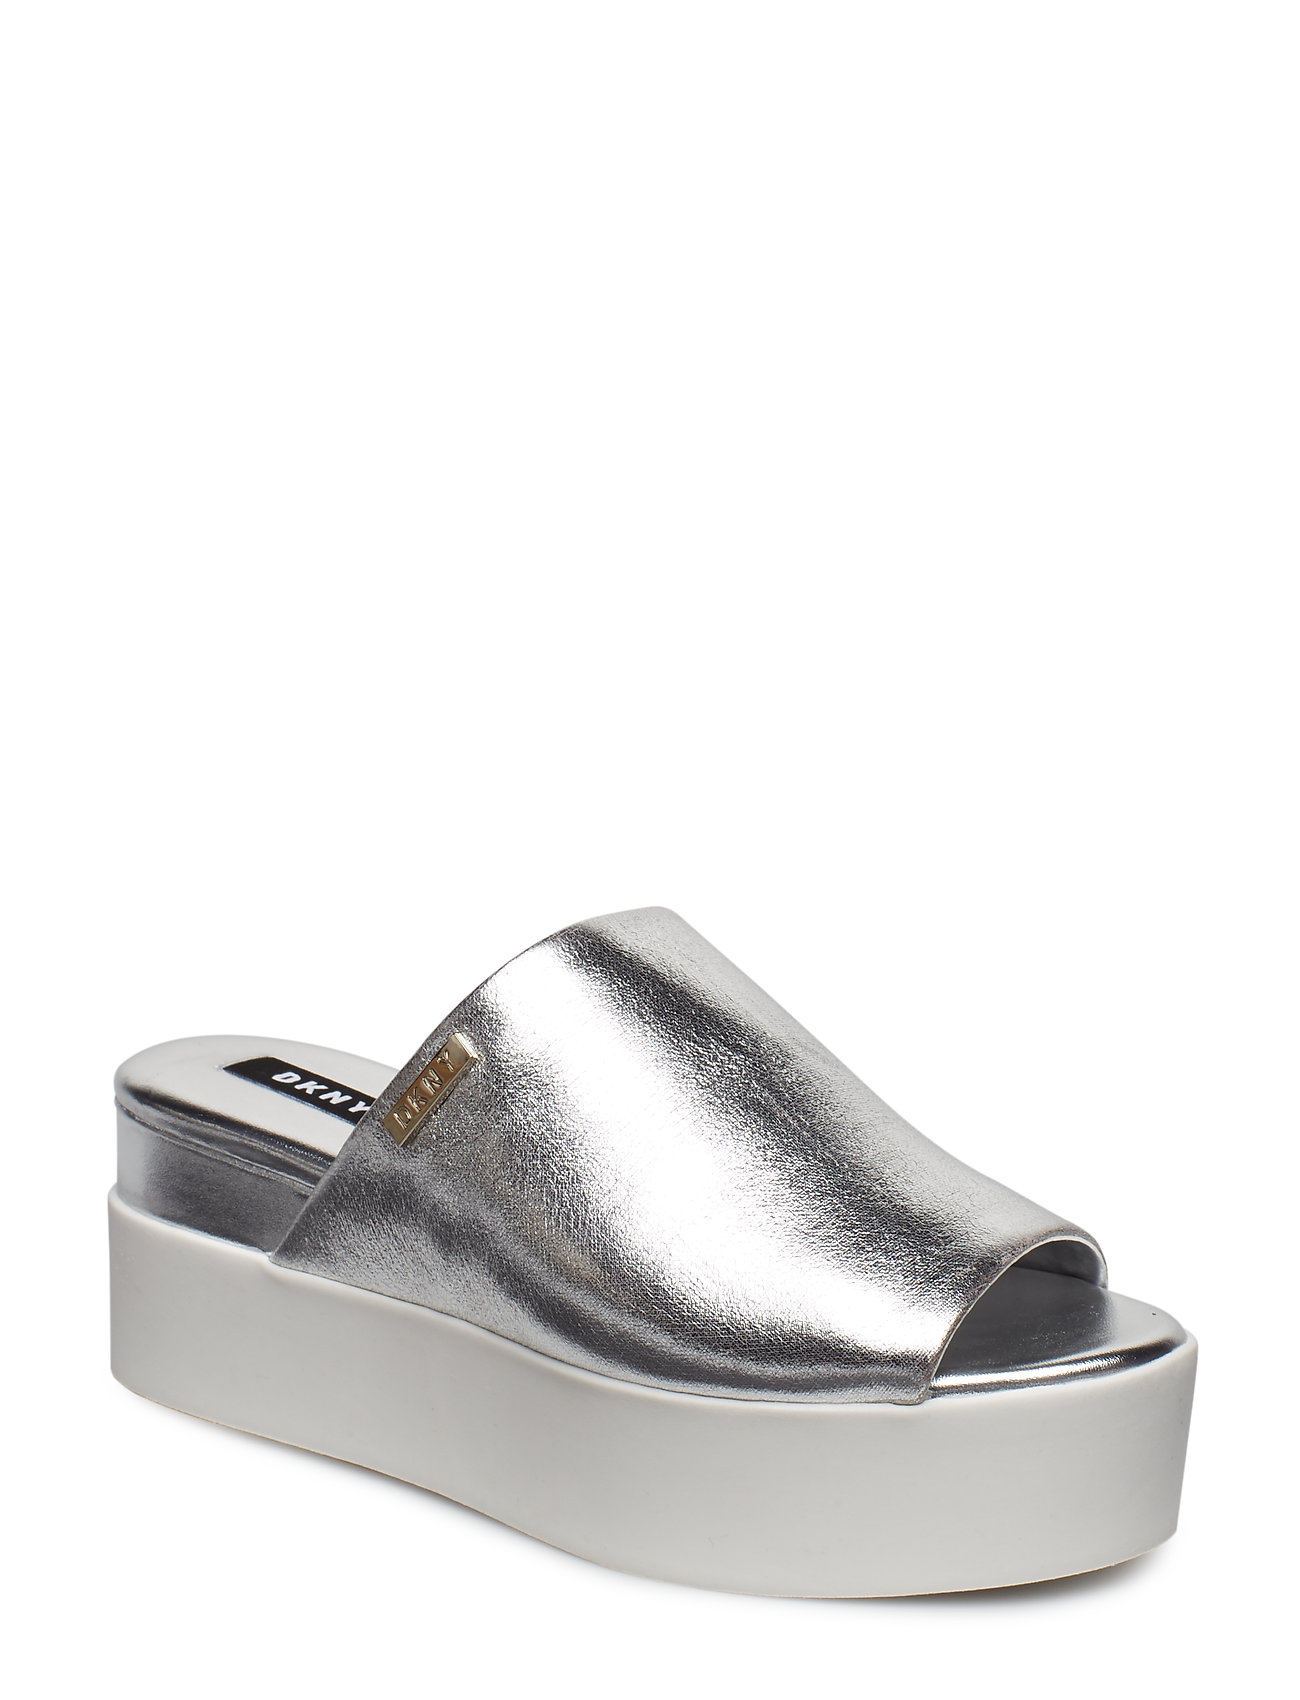 buy online 32b43 b3d46 35% Sale Carli Flache Sandalen Silber DKNY | foccz.com